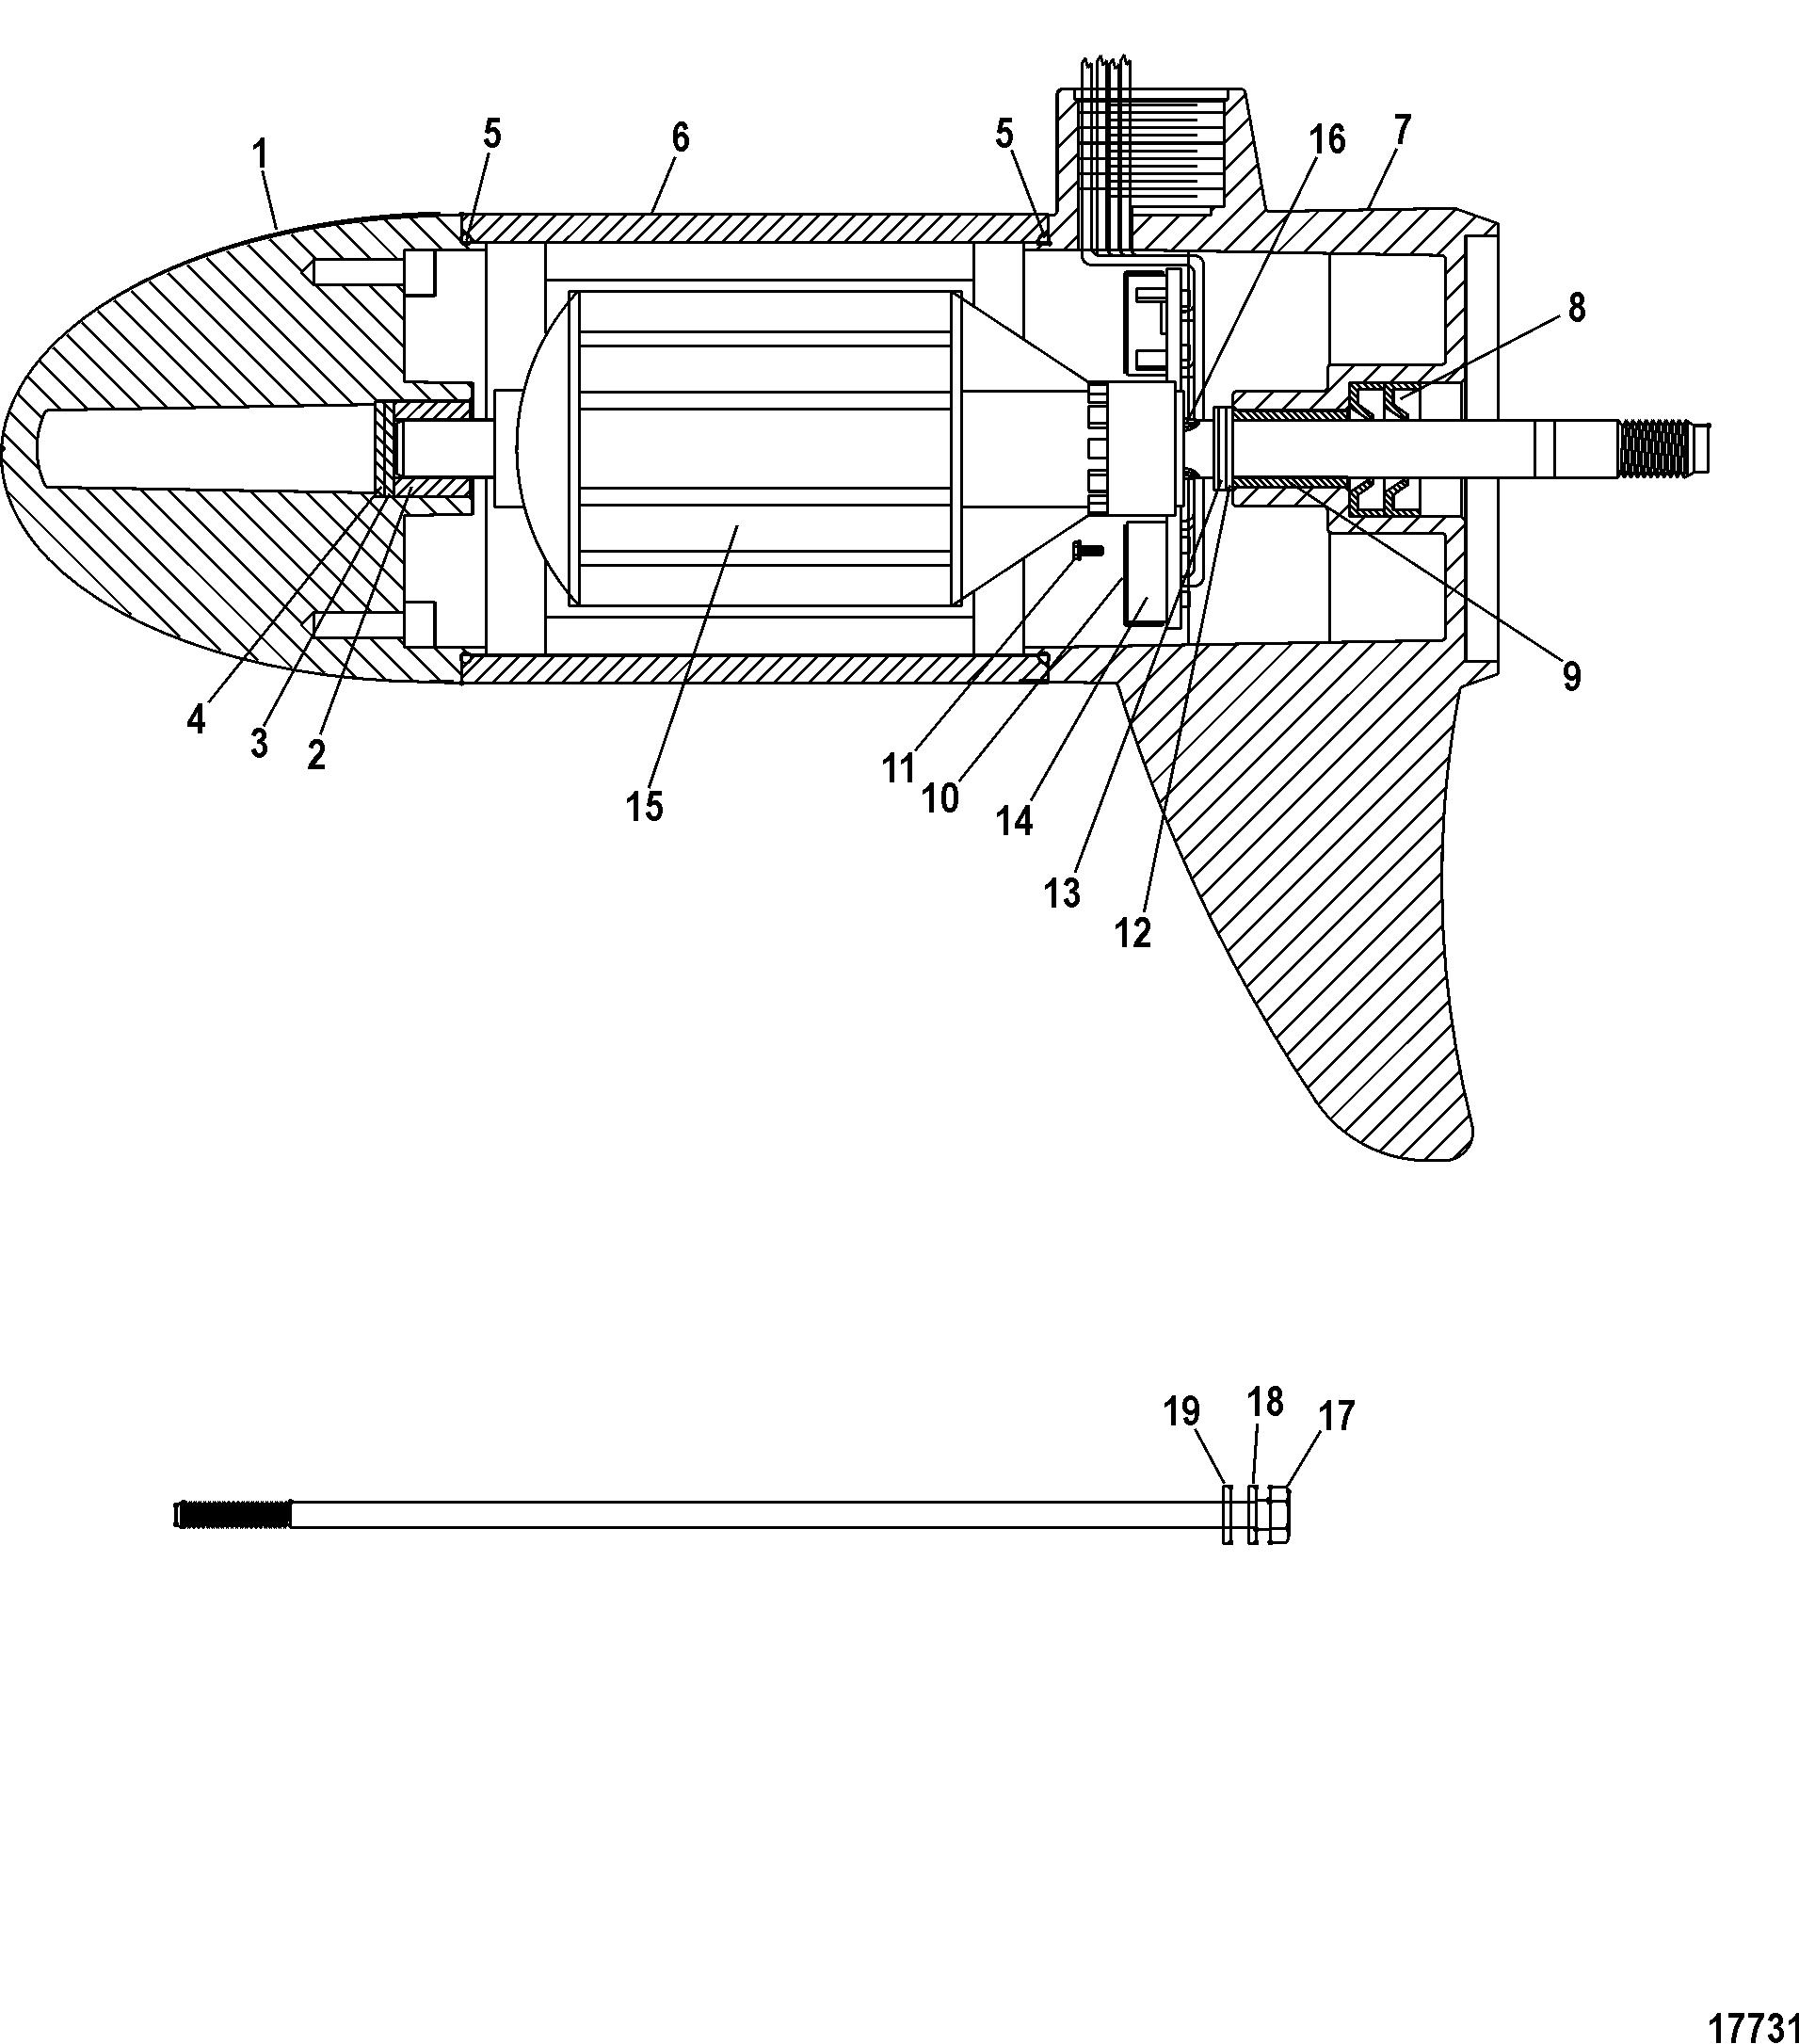 motorguide thruster series